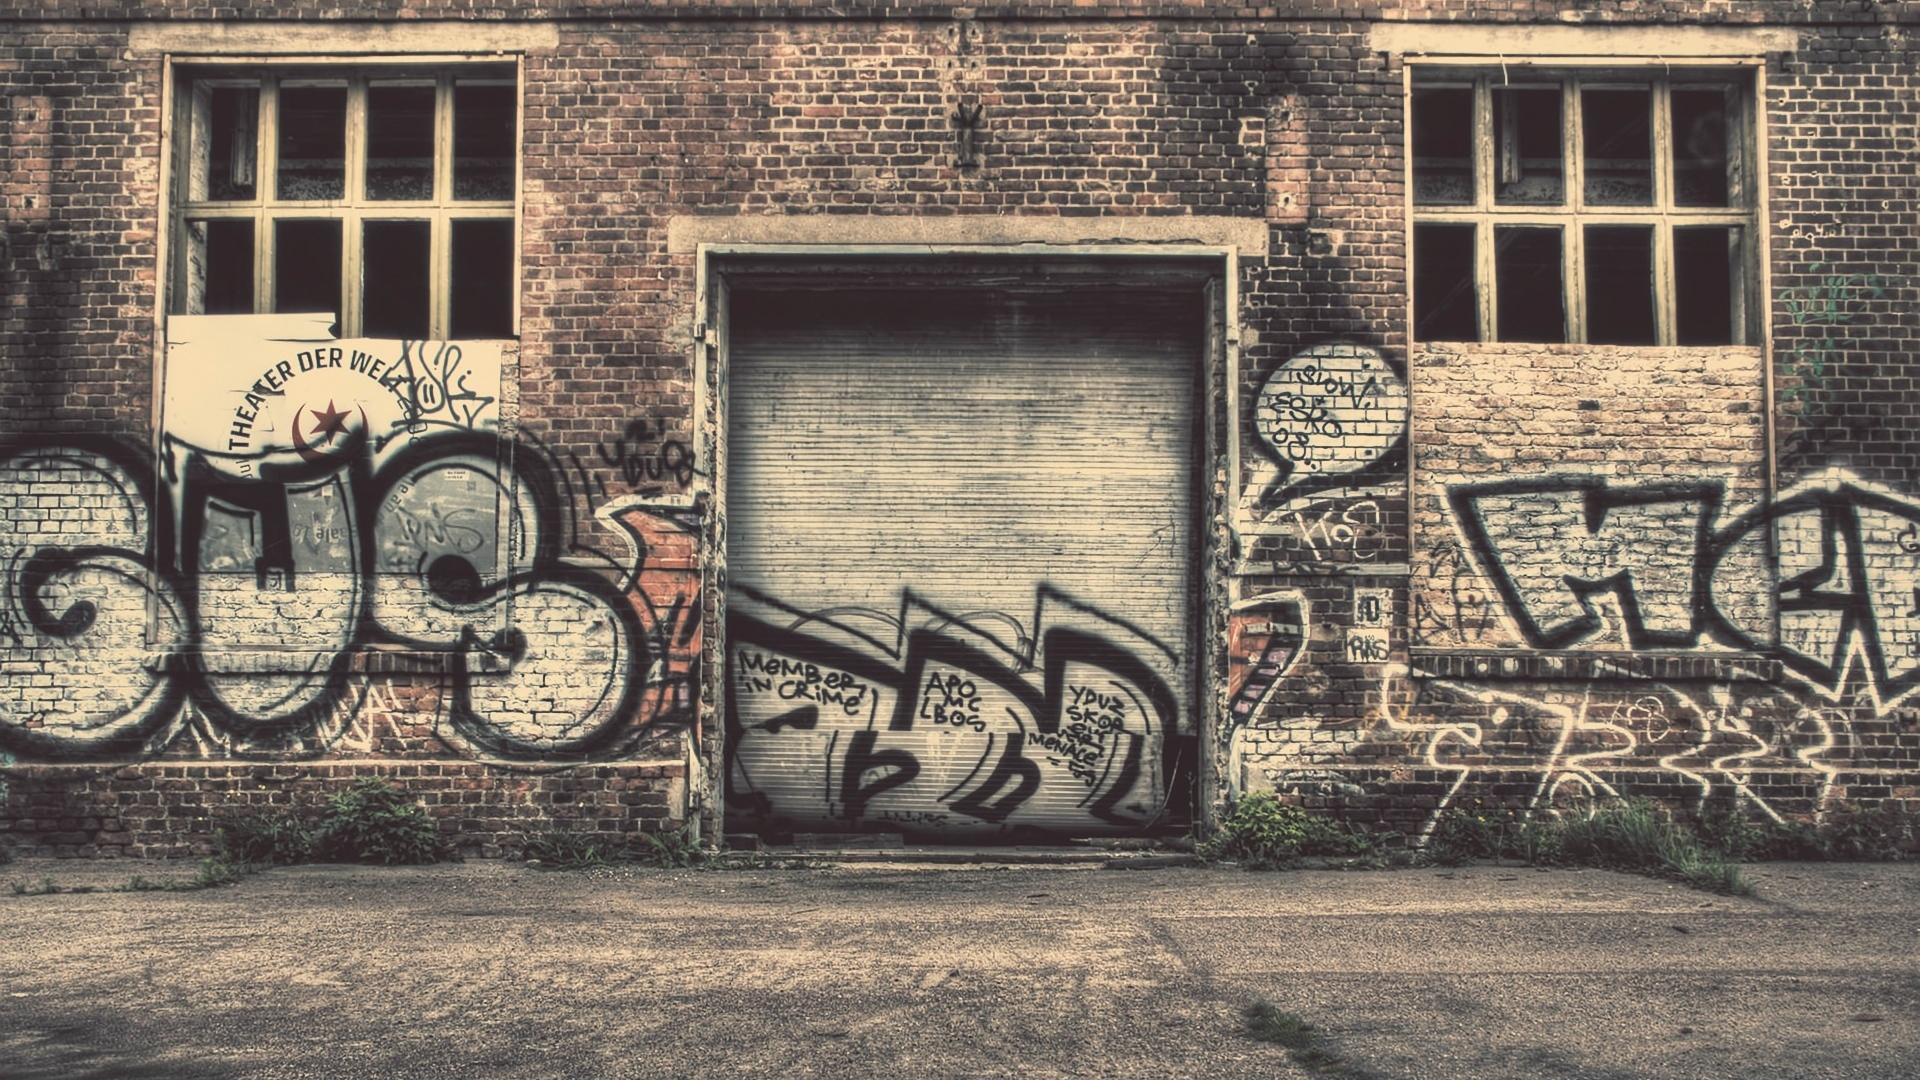 Download Graffiti Photography Wallpaper 50838 1920x1080 Px High Definition Wallpaper